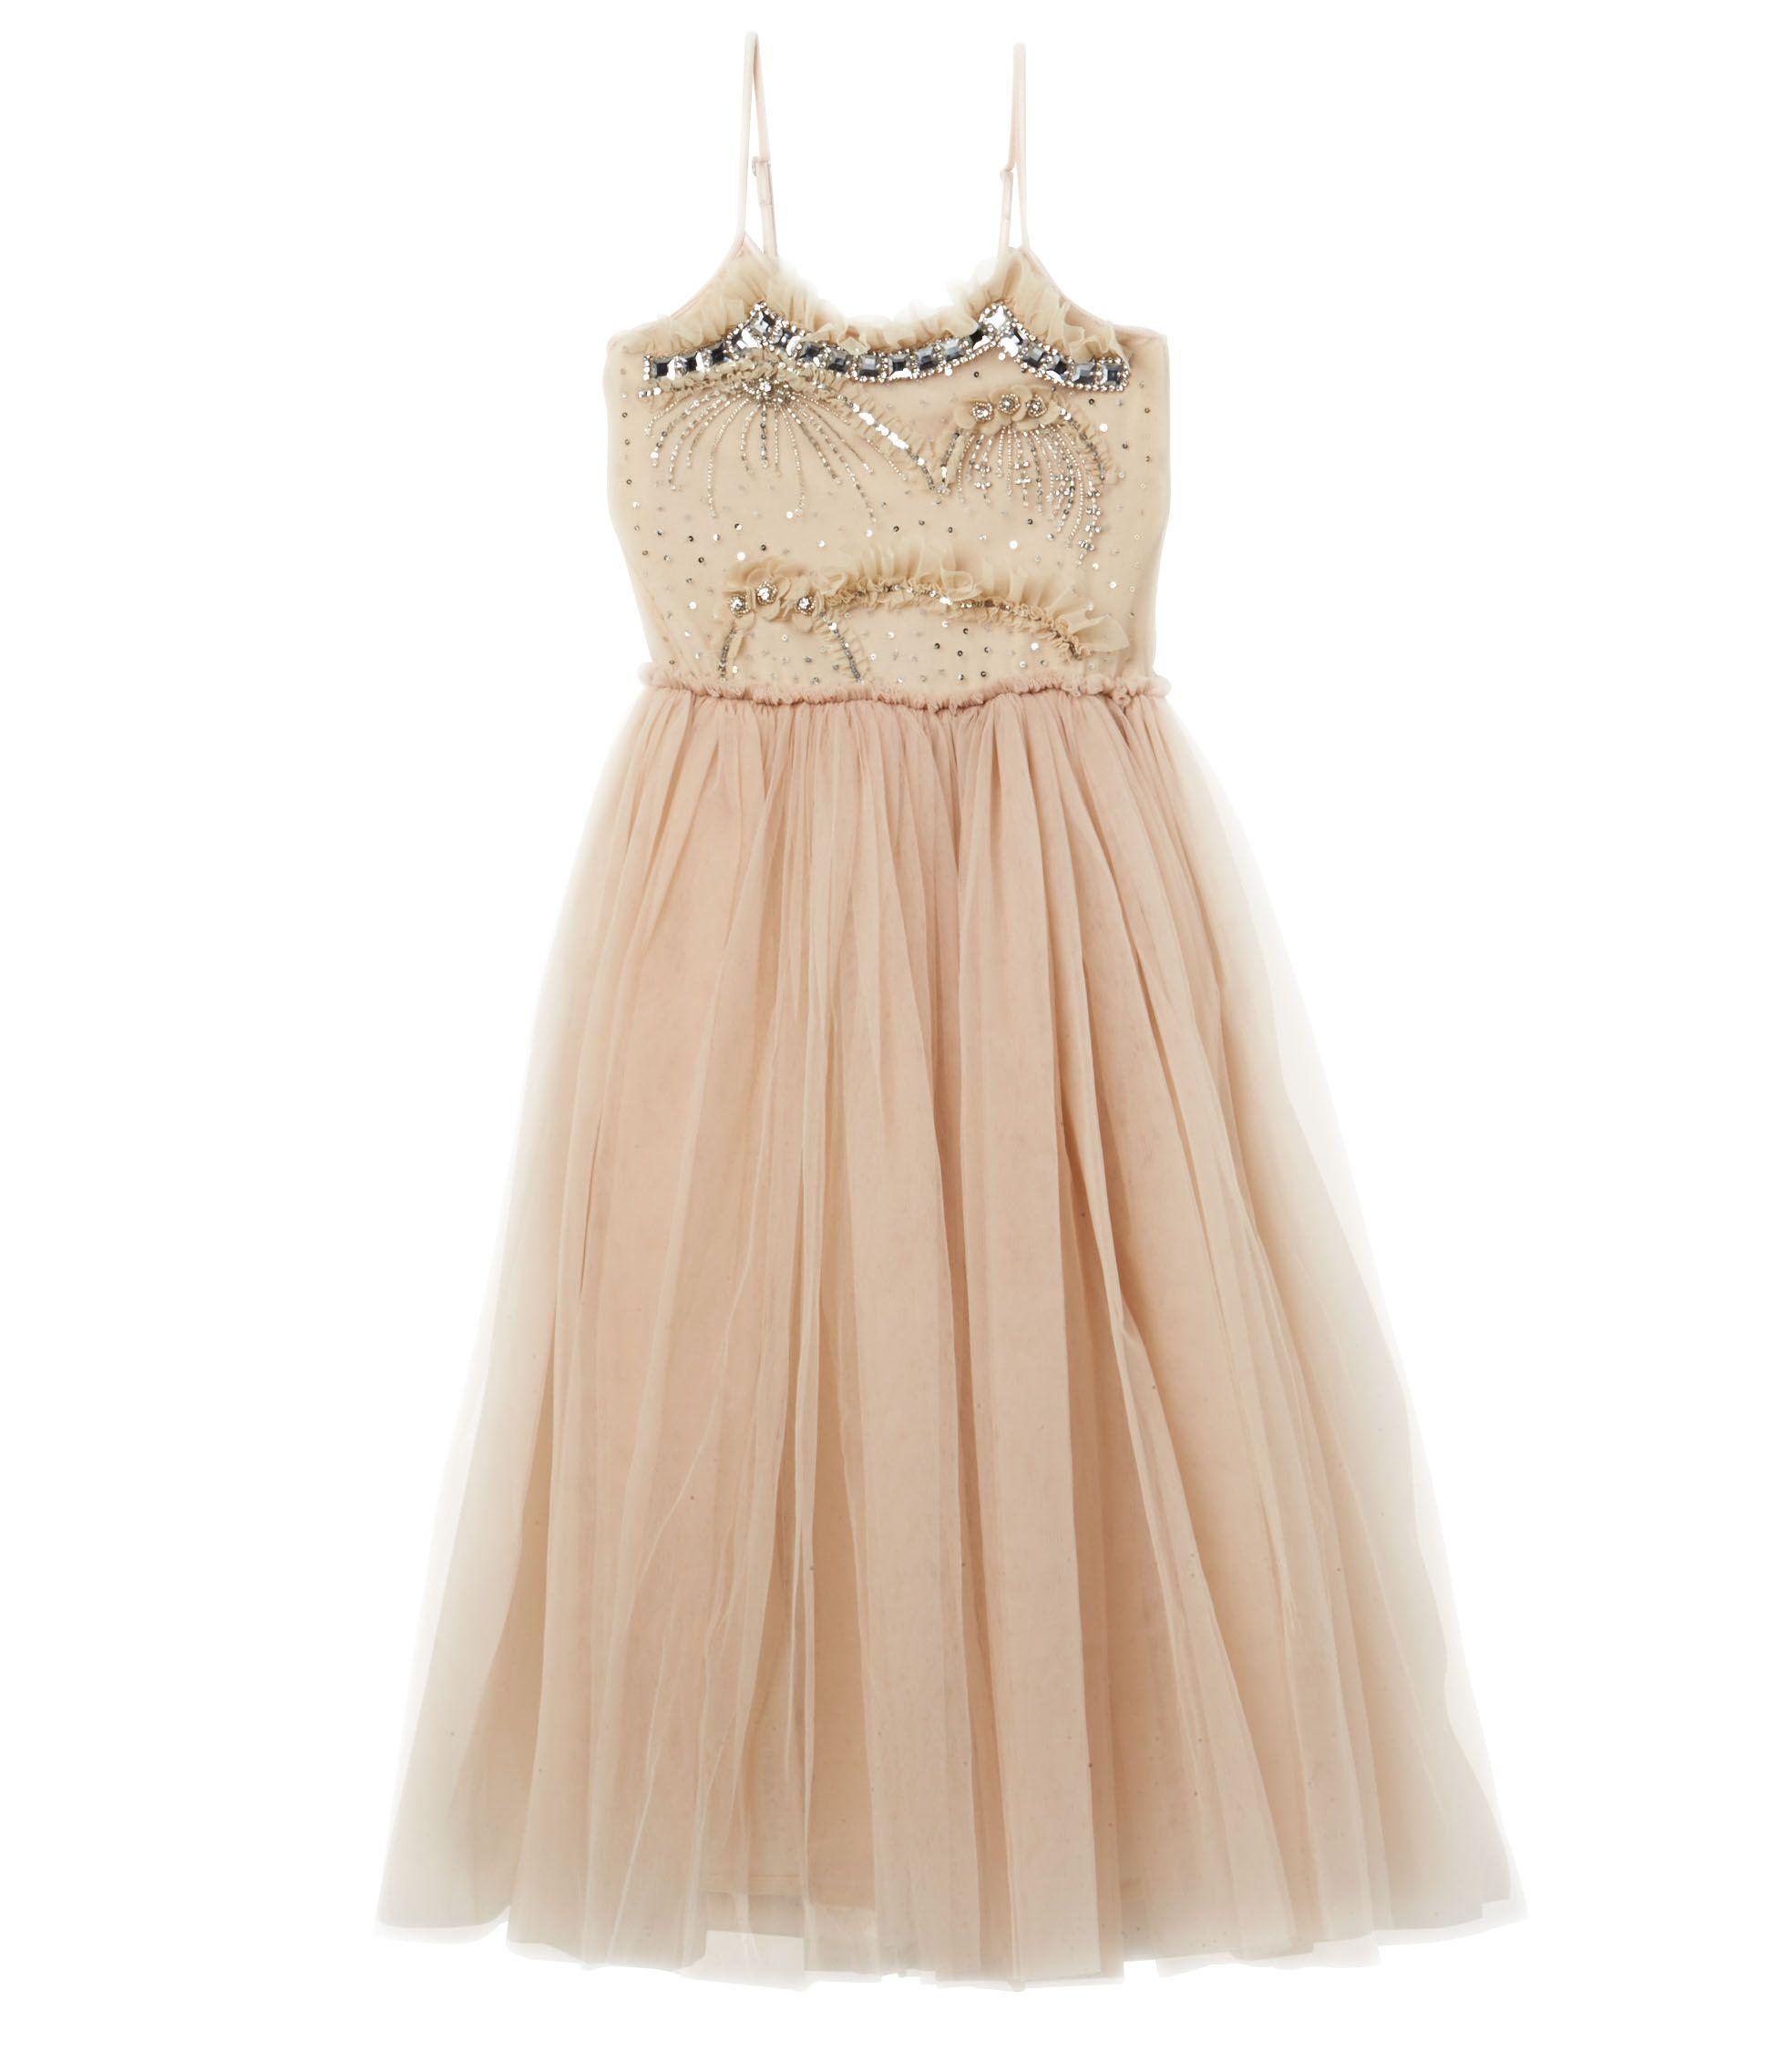 Rent your wedding dress  Tutu du Monde Tween Collection Olivia Tutu Dress in Lychee